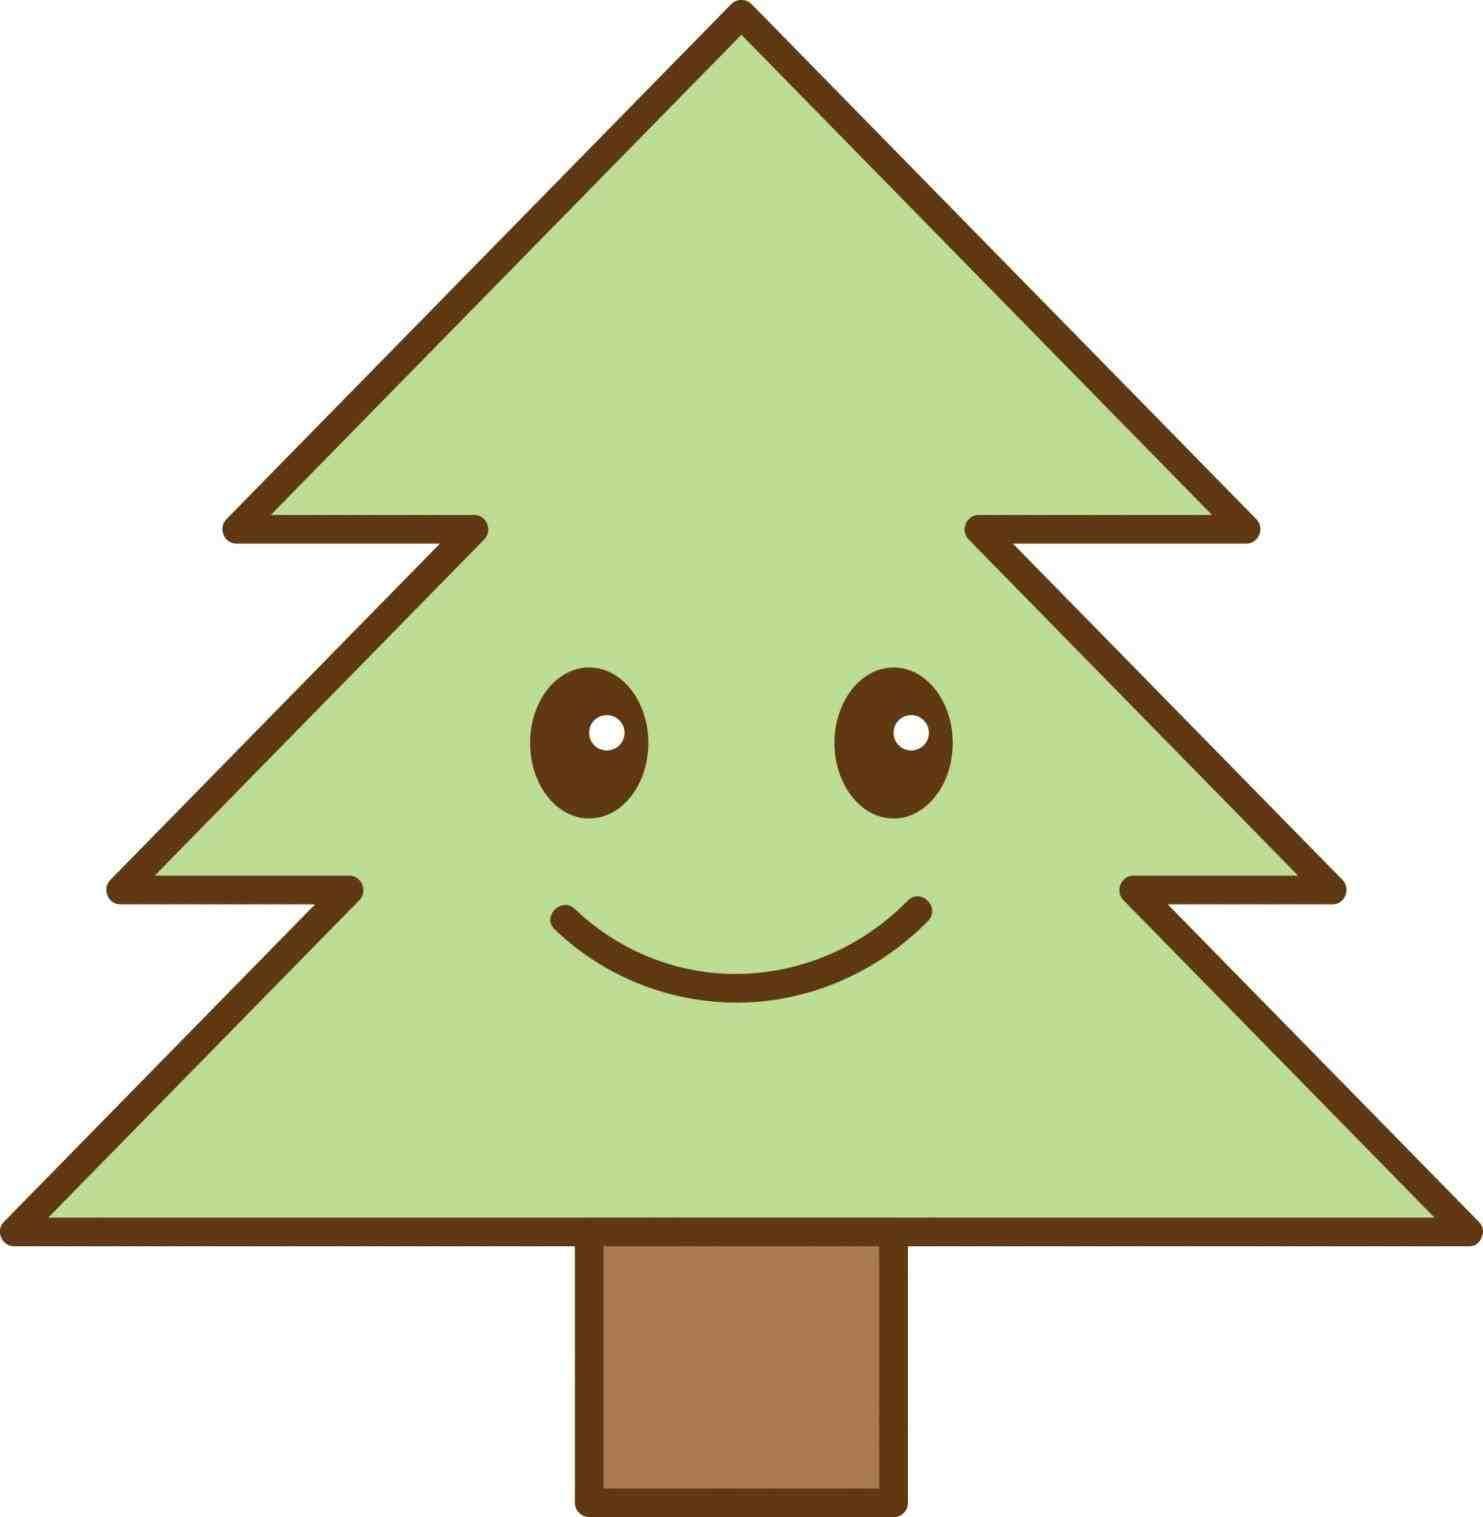 Christmas Tree Cookie Clip Art Christmas Tree Cookies Christmas Tree Tree Free